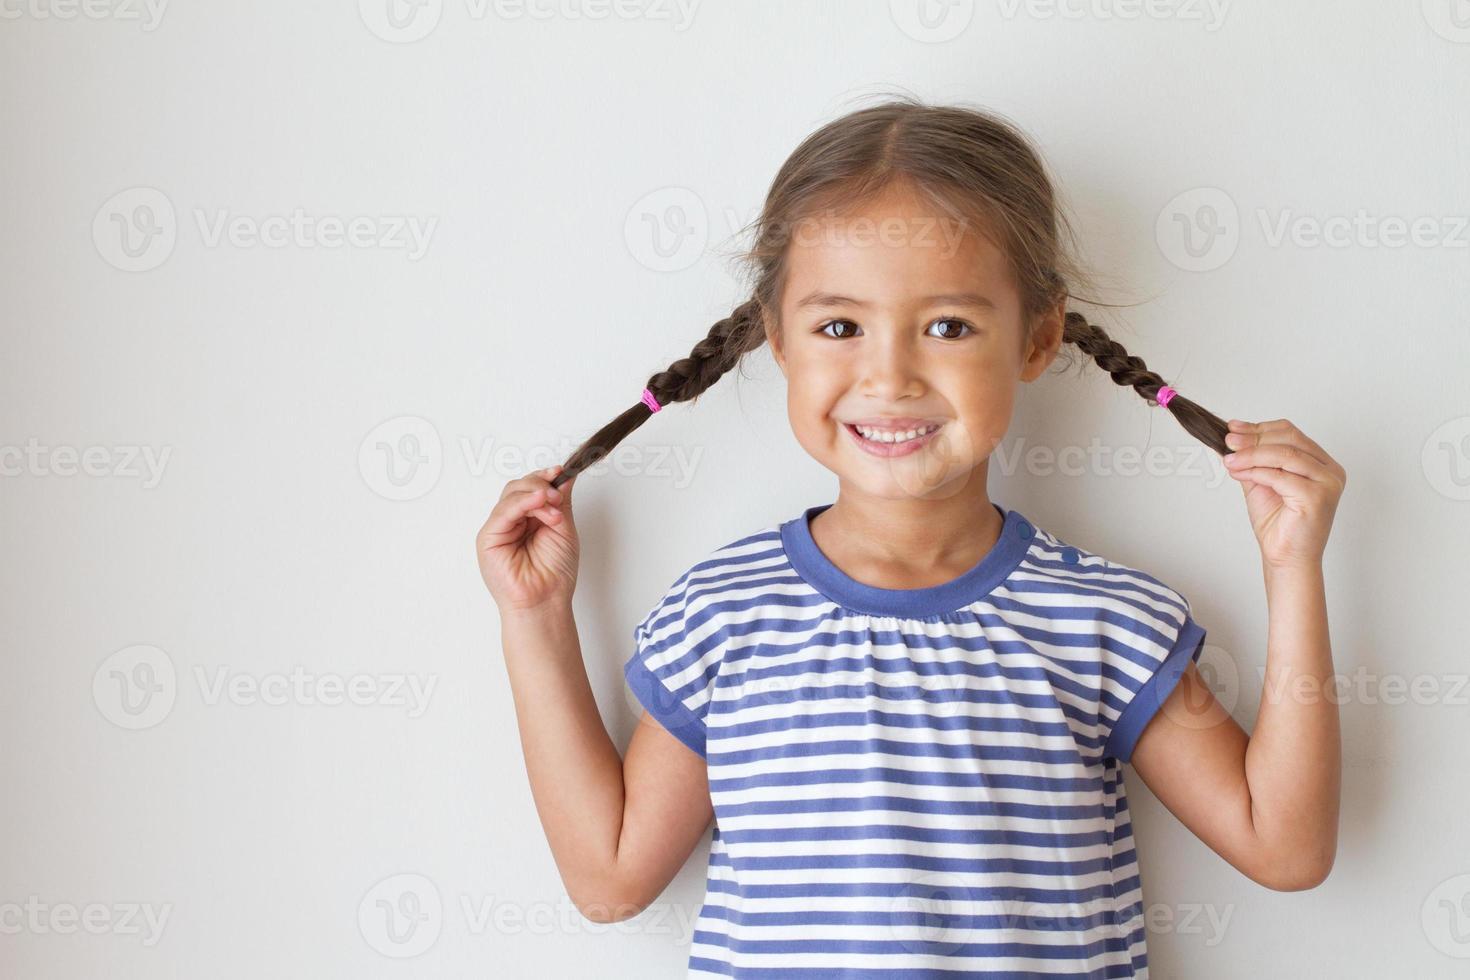 portret van gelukkig, positief, glimlachend, speels Aziatisch Kaukasisch jong geitje foto